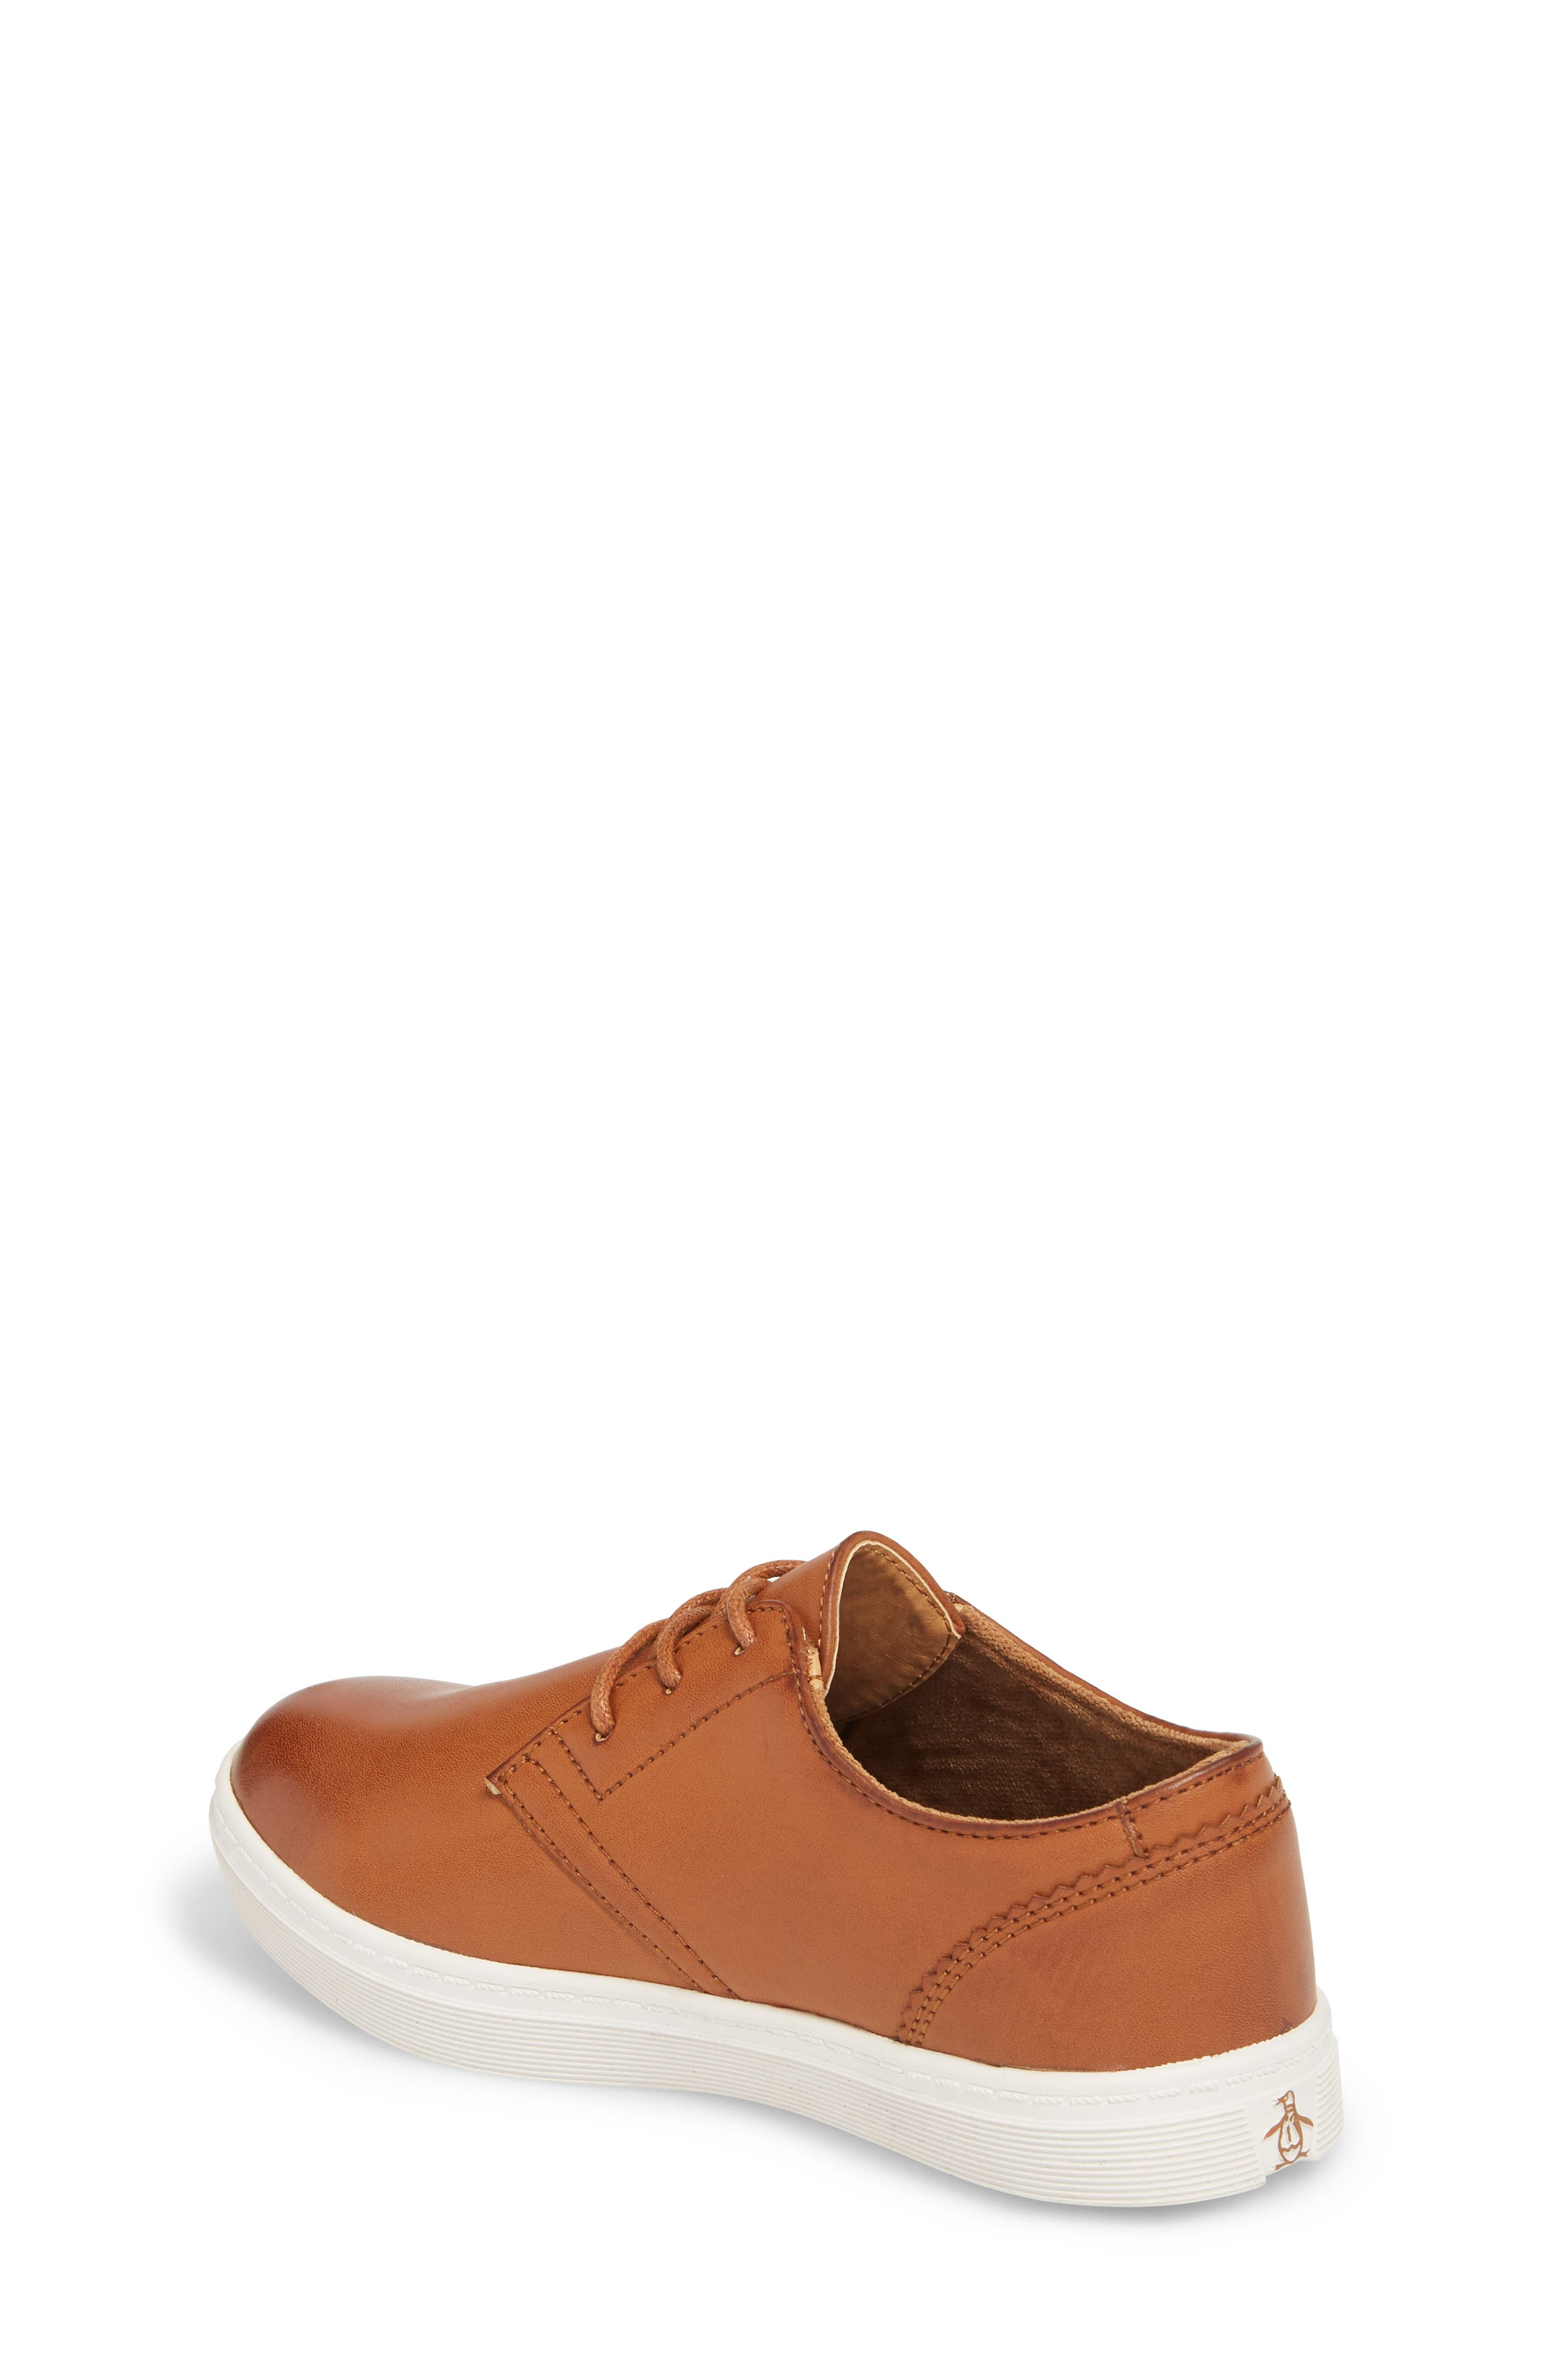 ORIGINAL PENGUIN, Freeland Sneaker, Alternate thumbnail 2, color, COGNAC